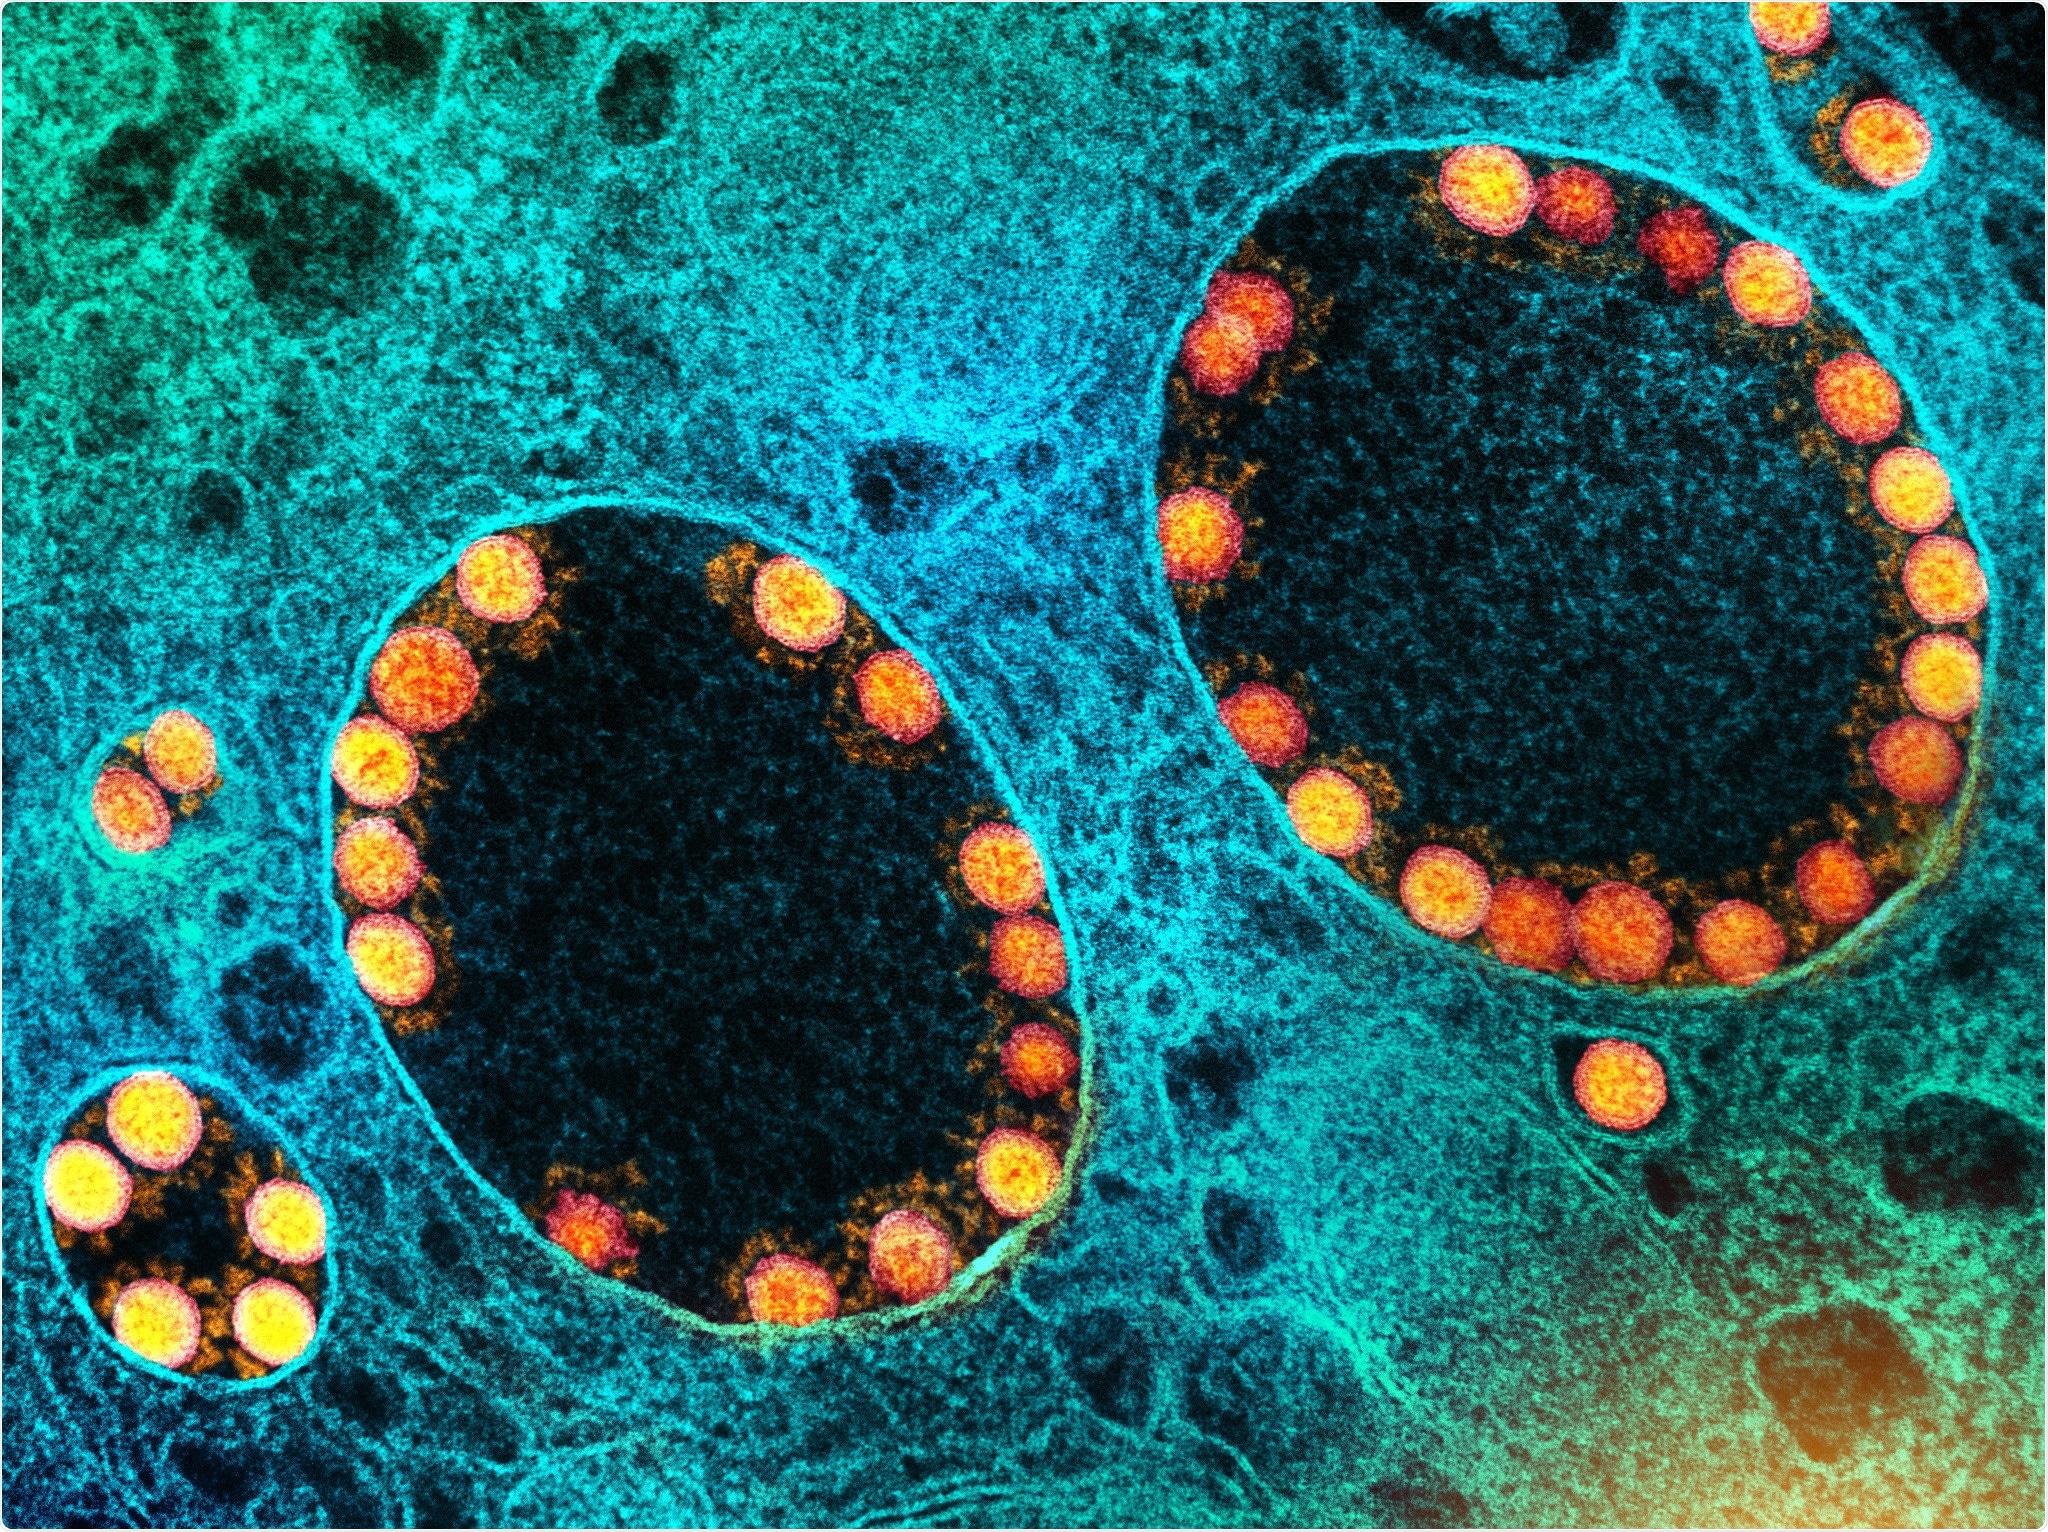 Study: Humoral immune responses against seasonal coronaviruses predict efficiency of SARS-CoV-2 spike targeting, FcγR activation, and corresponding COVID-19 disease severity. Image Credit: NIAID